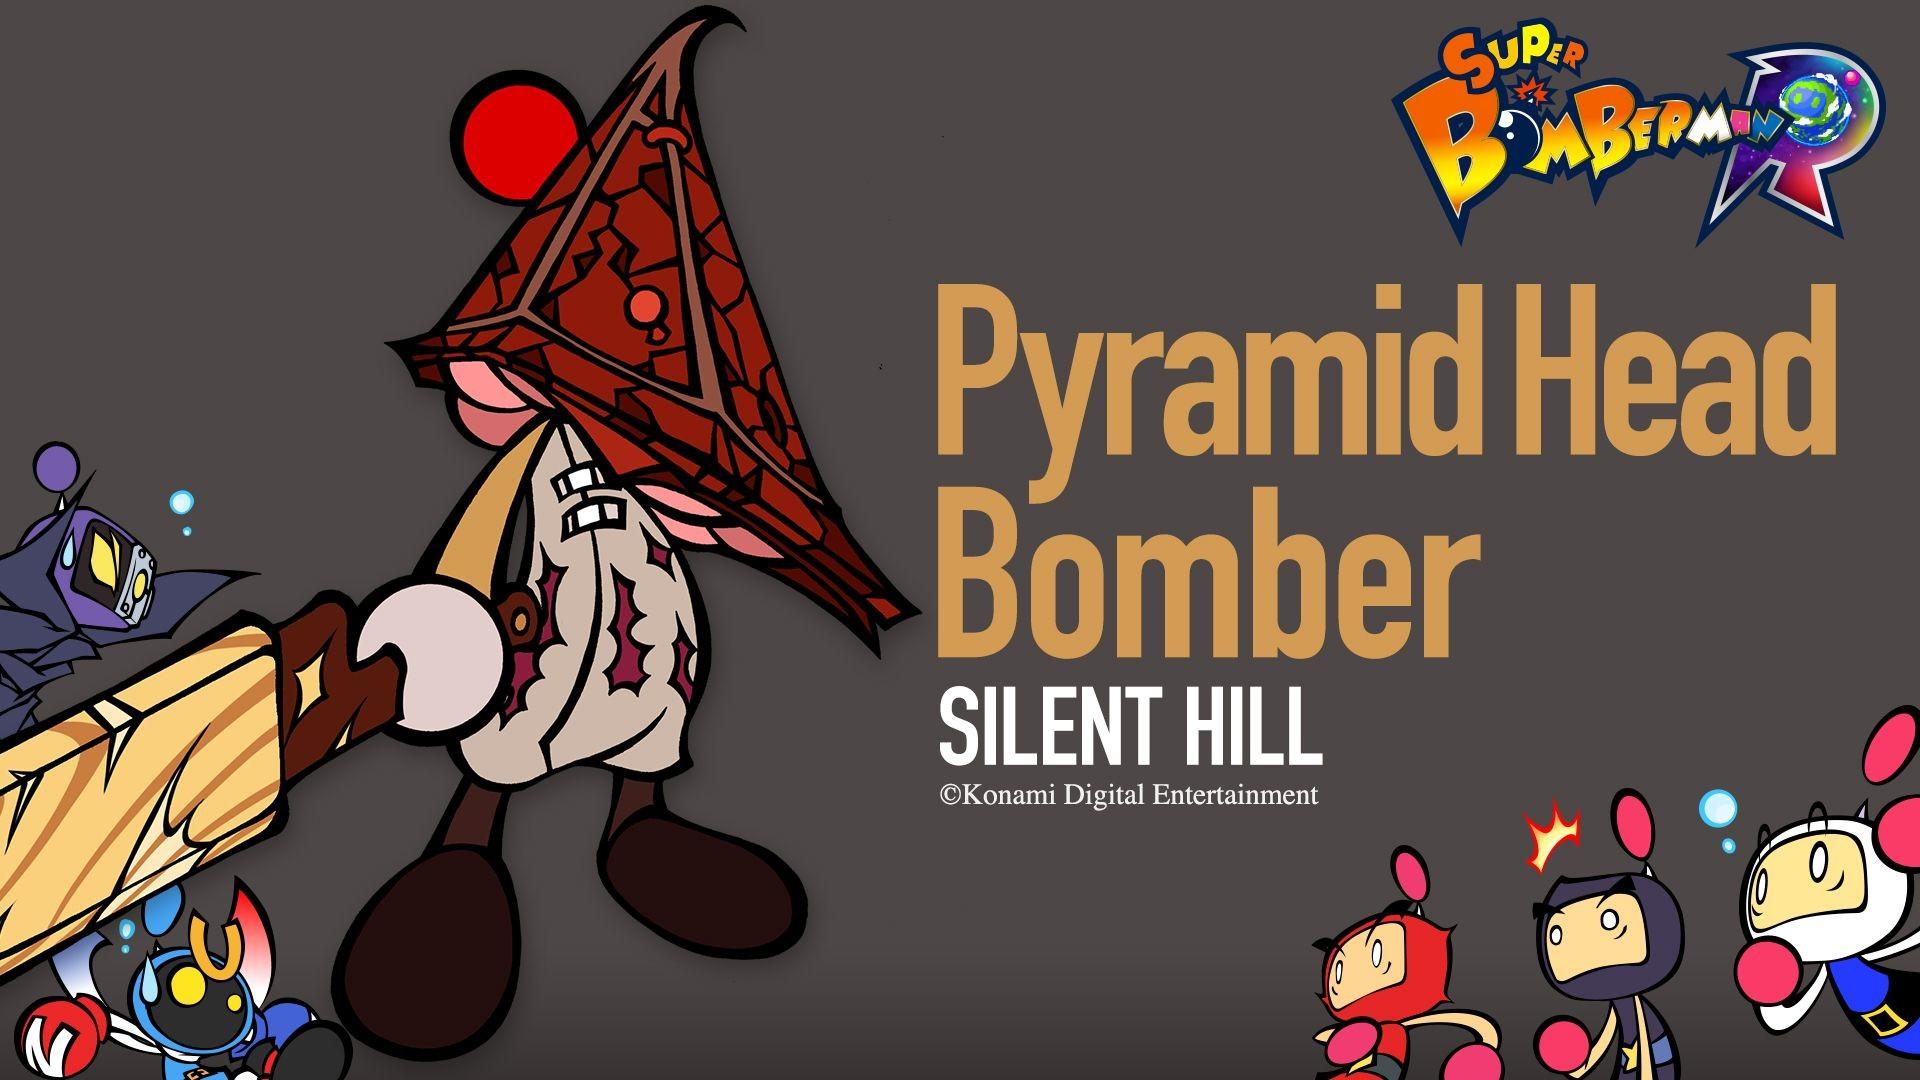 Super Bomberman R gets Silent Hill crossover